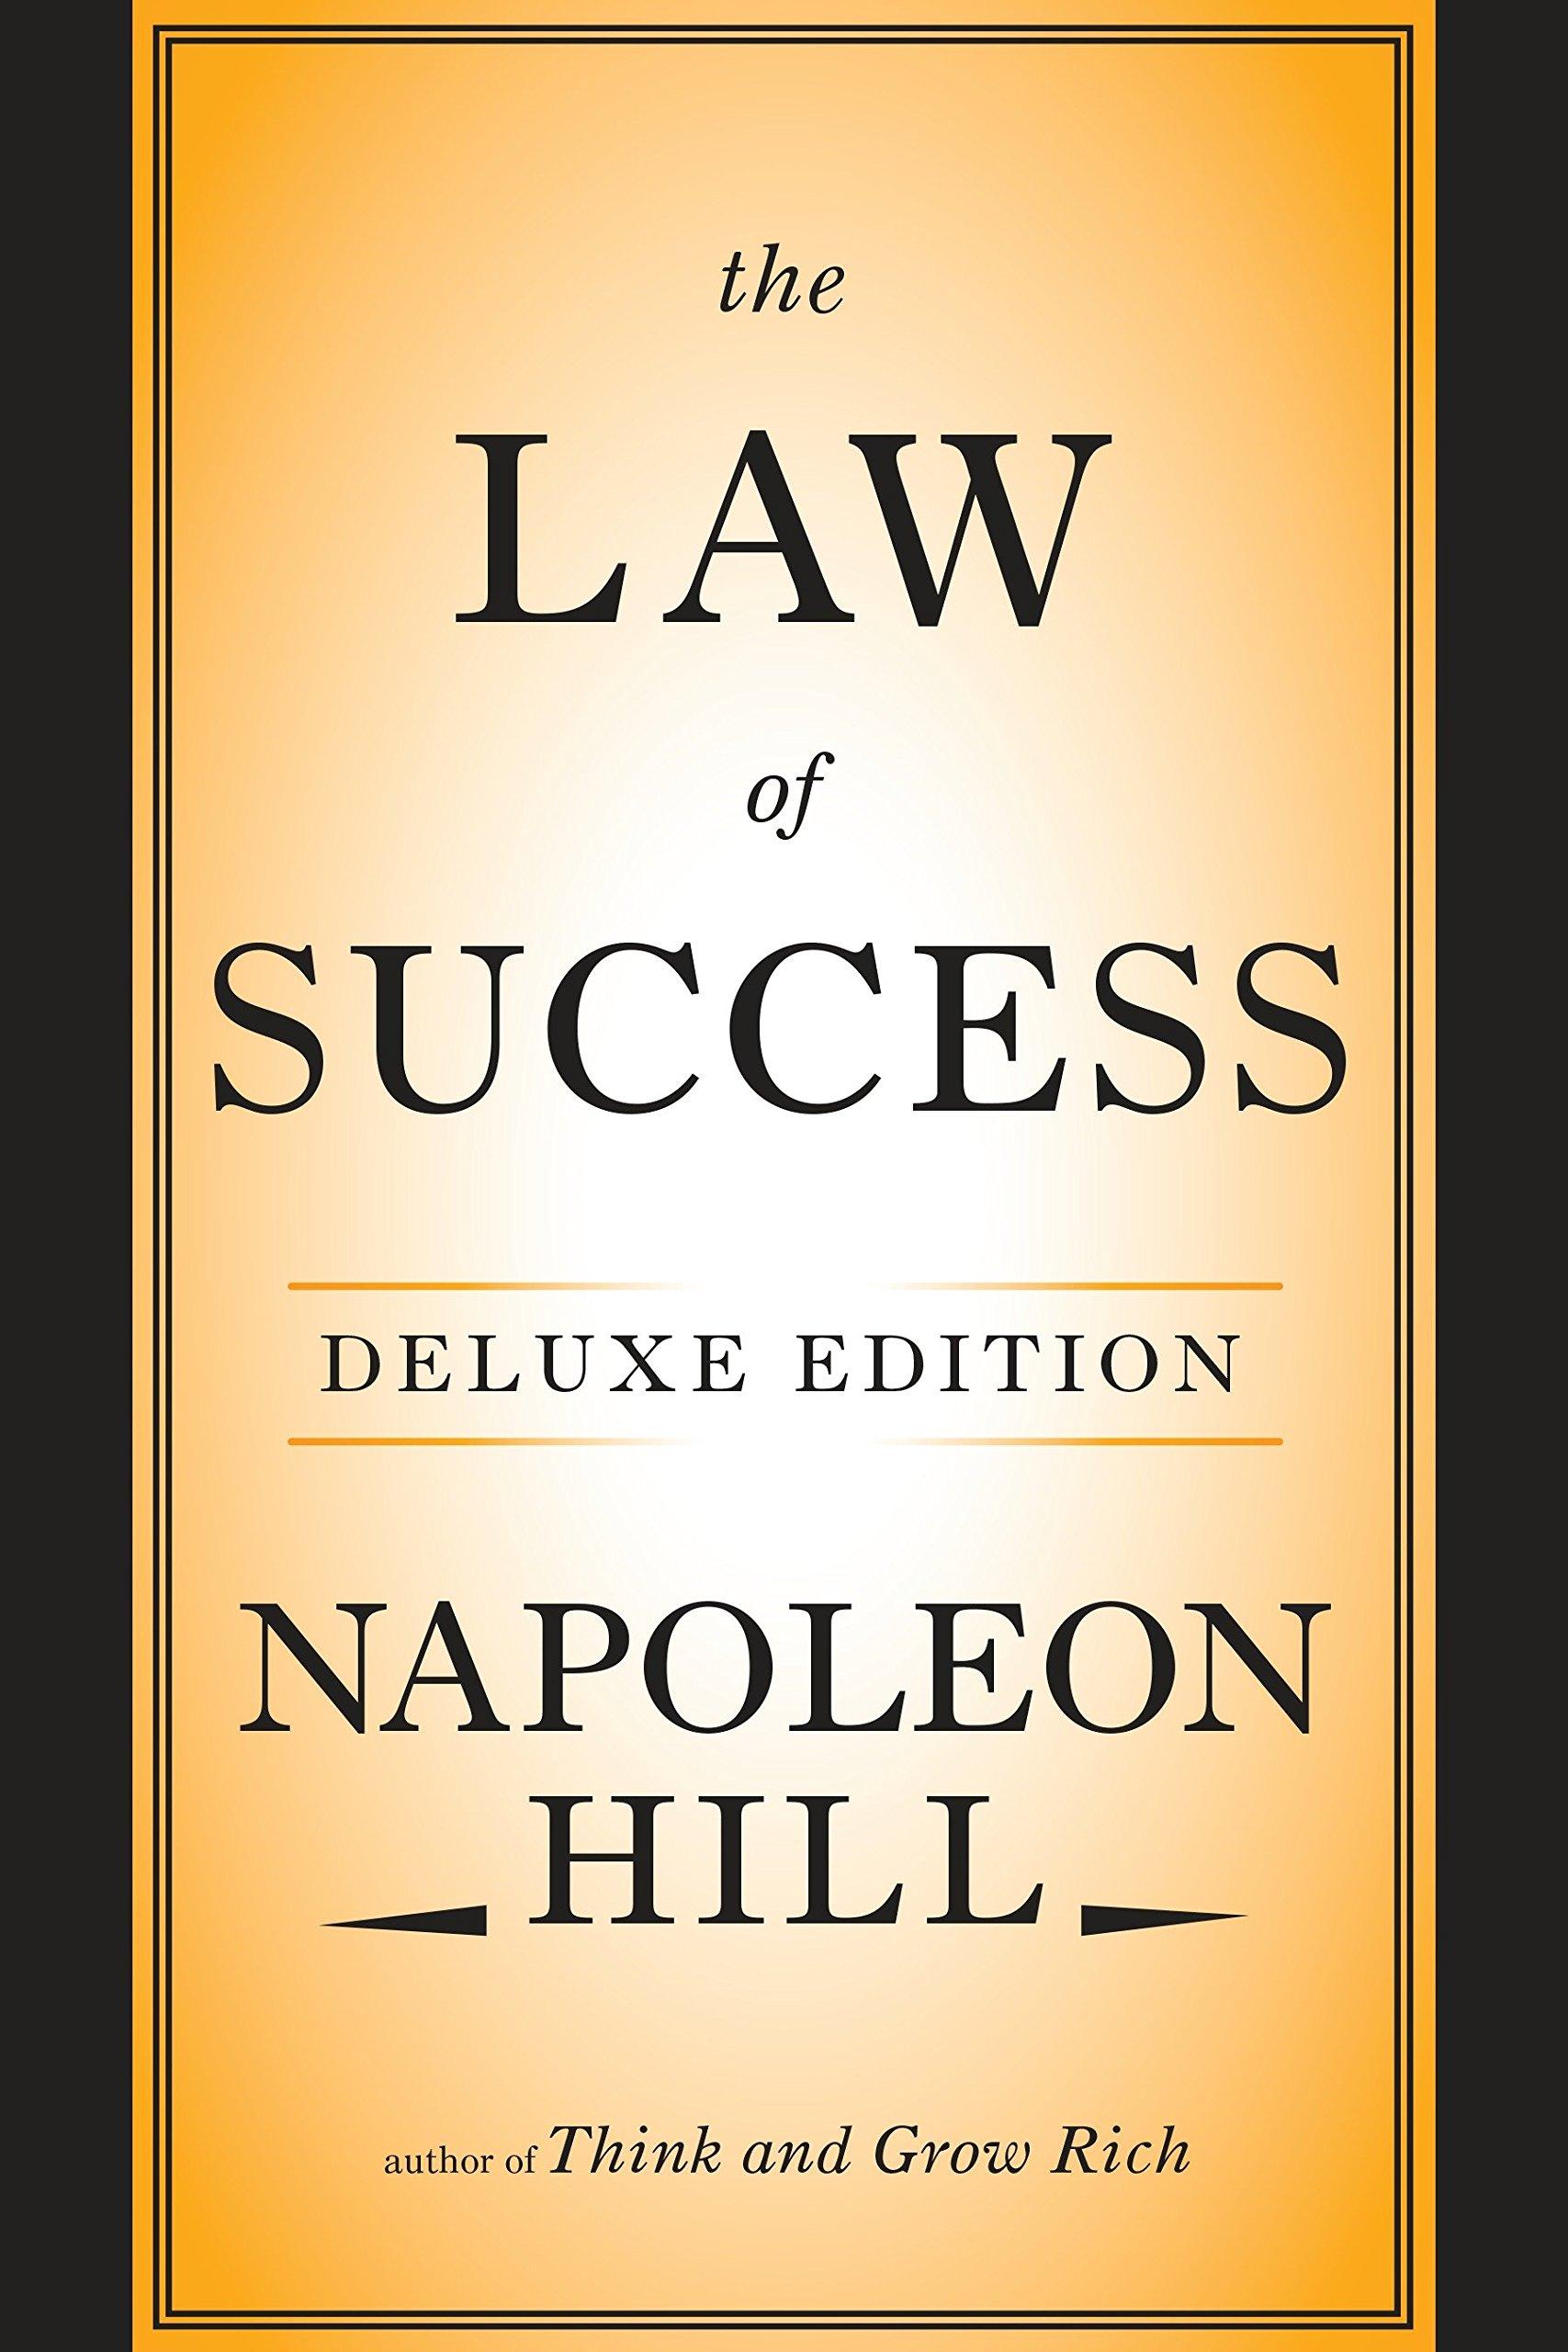 law of success summary